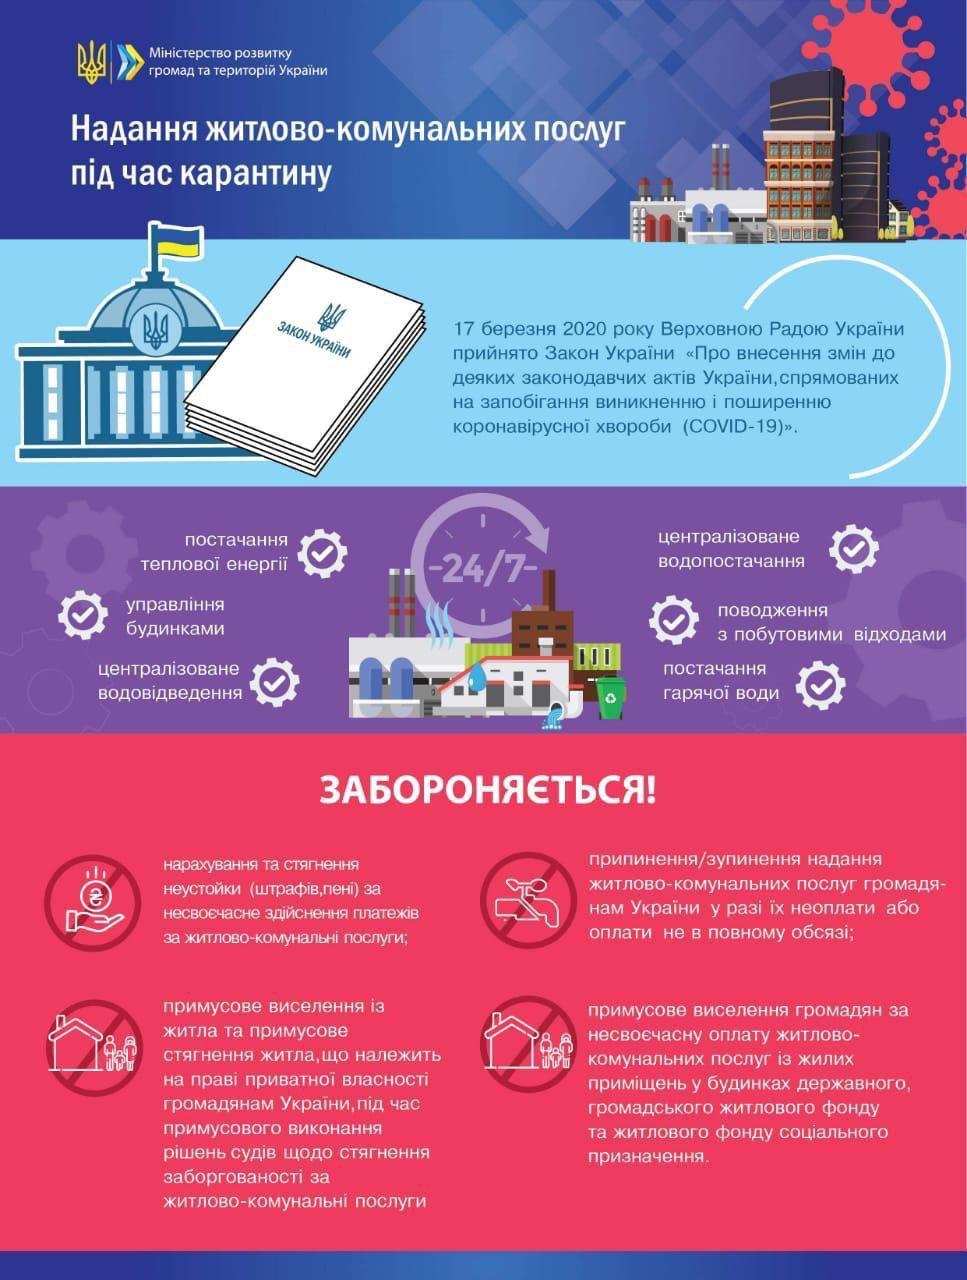 image http://forum.setam.net.ua/assets/images/125-oAKI2Q6jiqbLFEea.jpeg